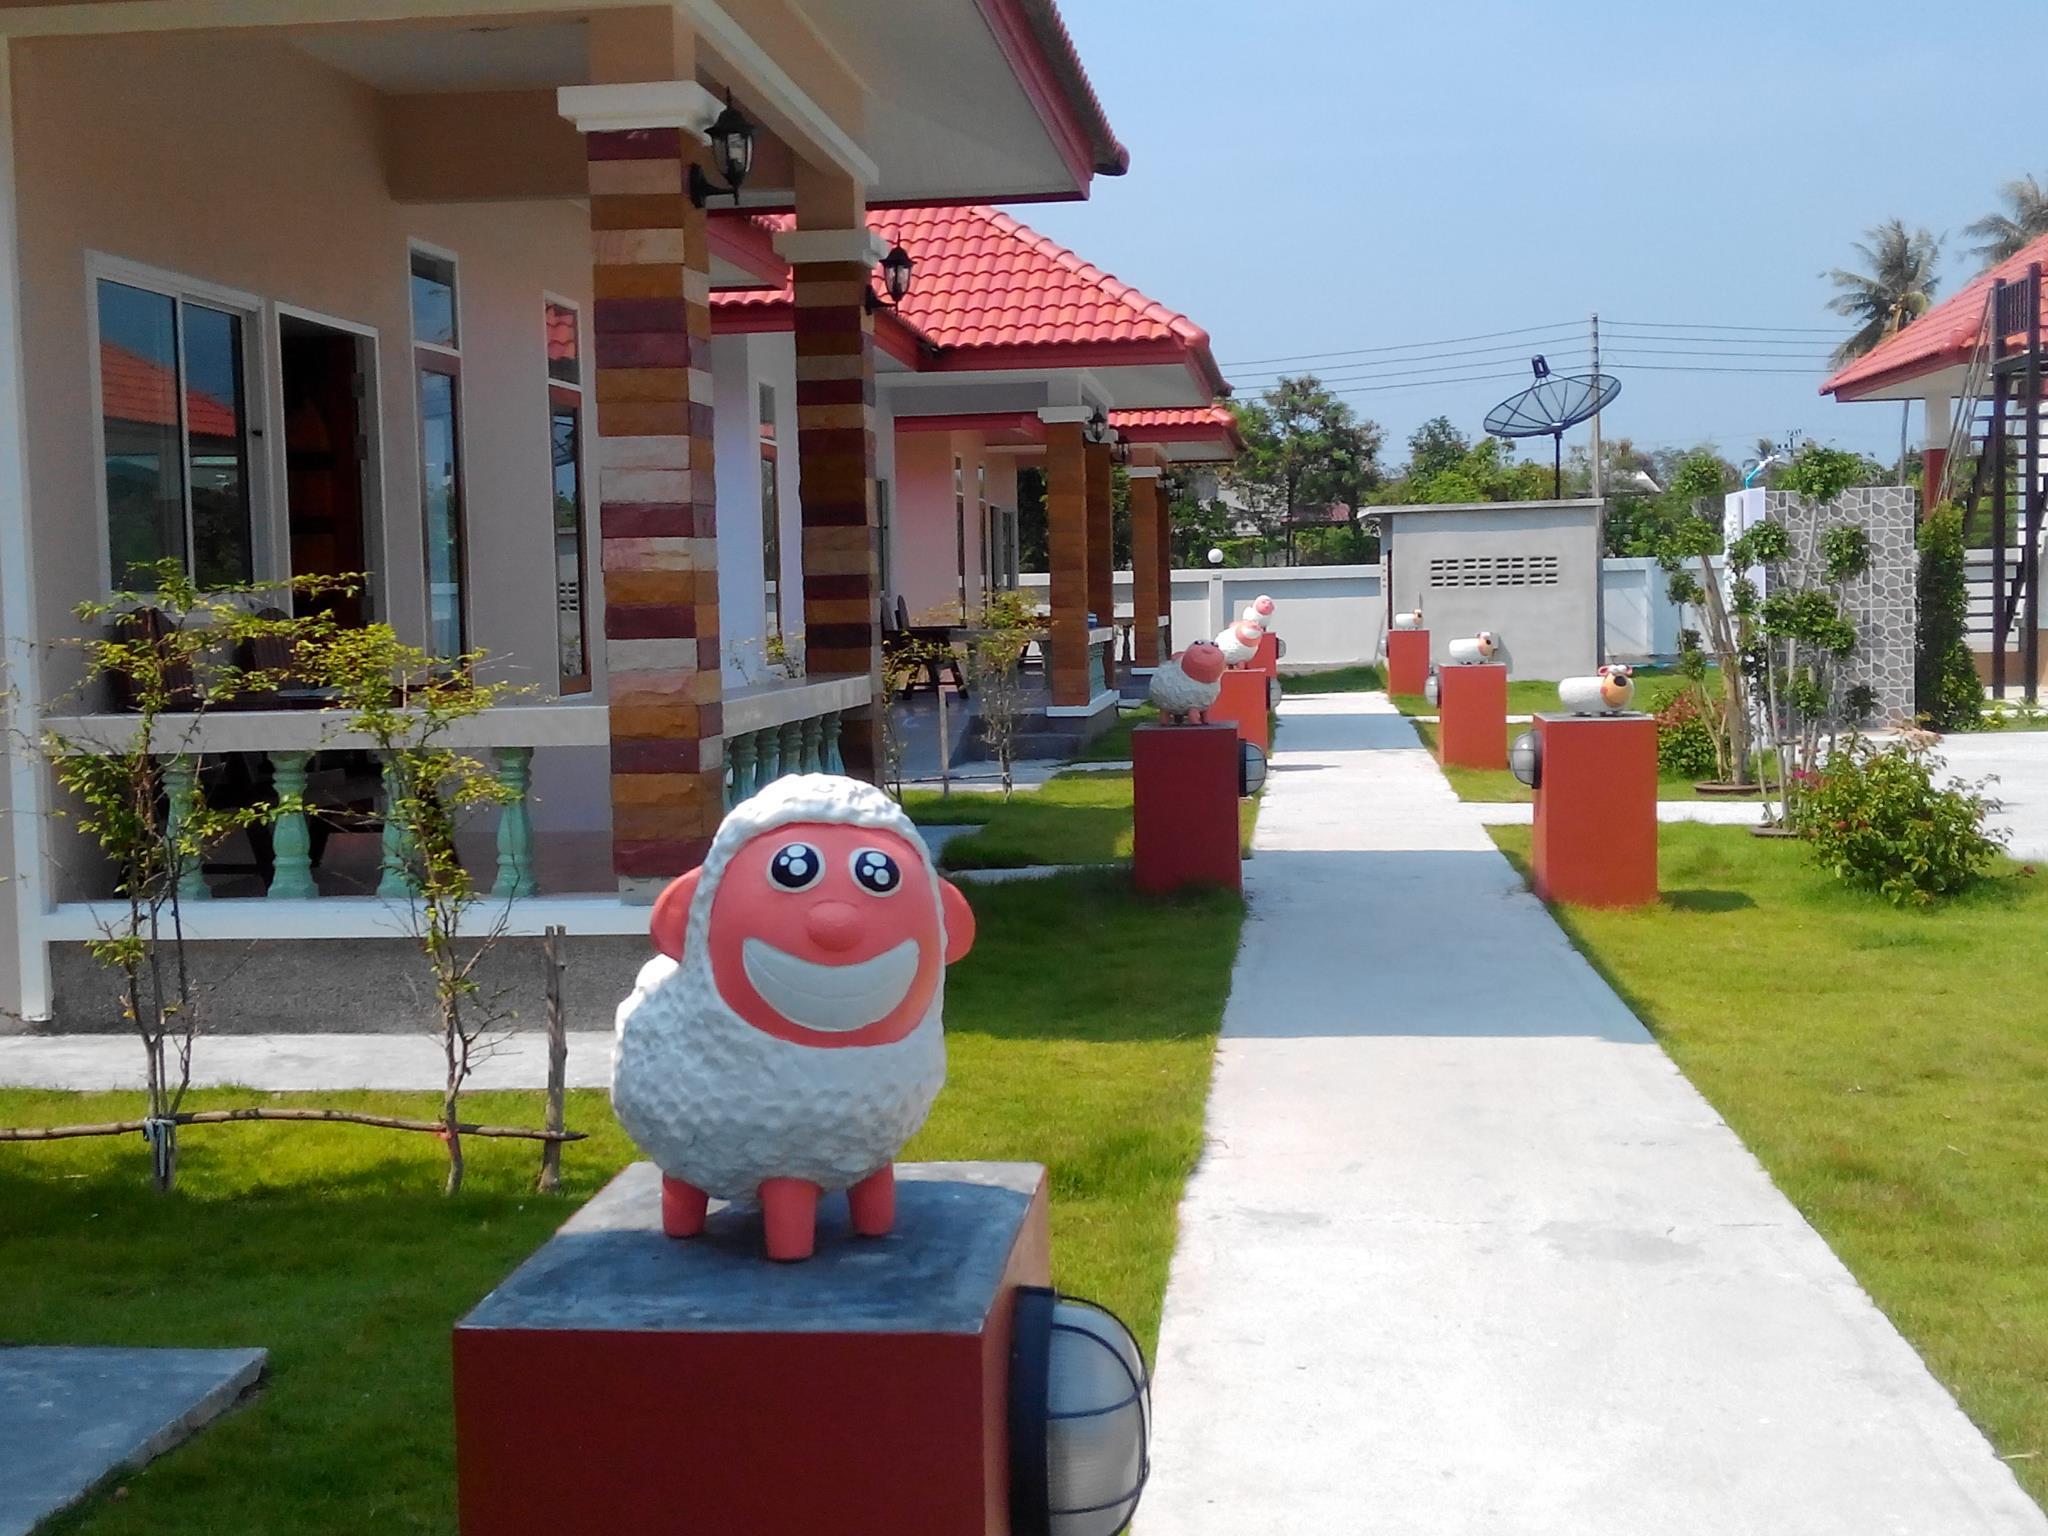 Garden Home Resort and Long Stay,Garden Home Resort and Long Stay